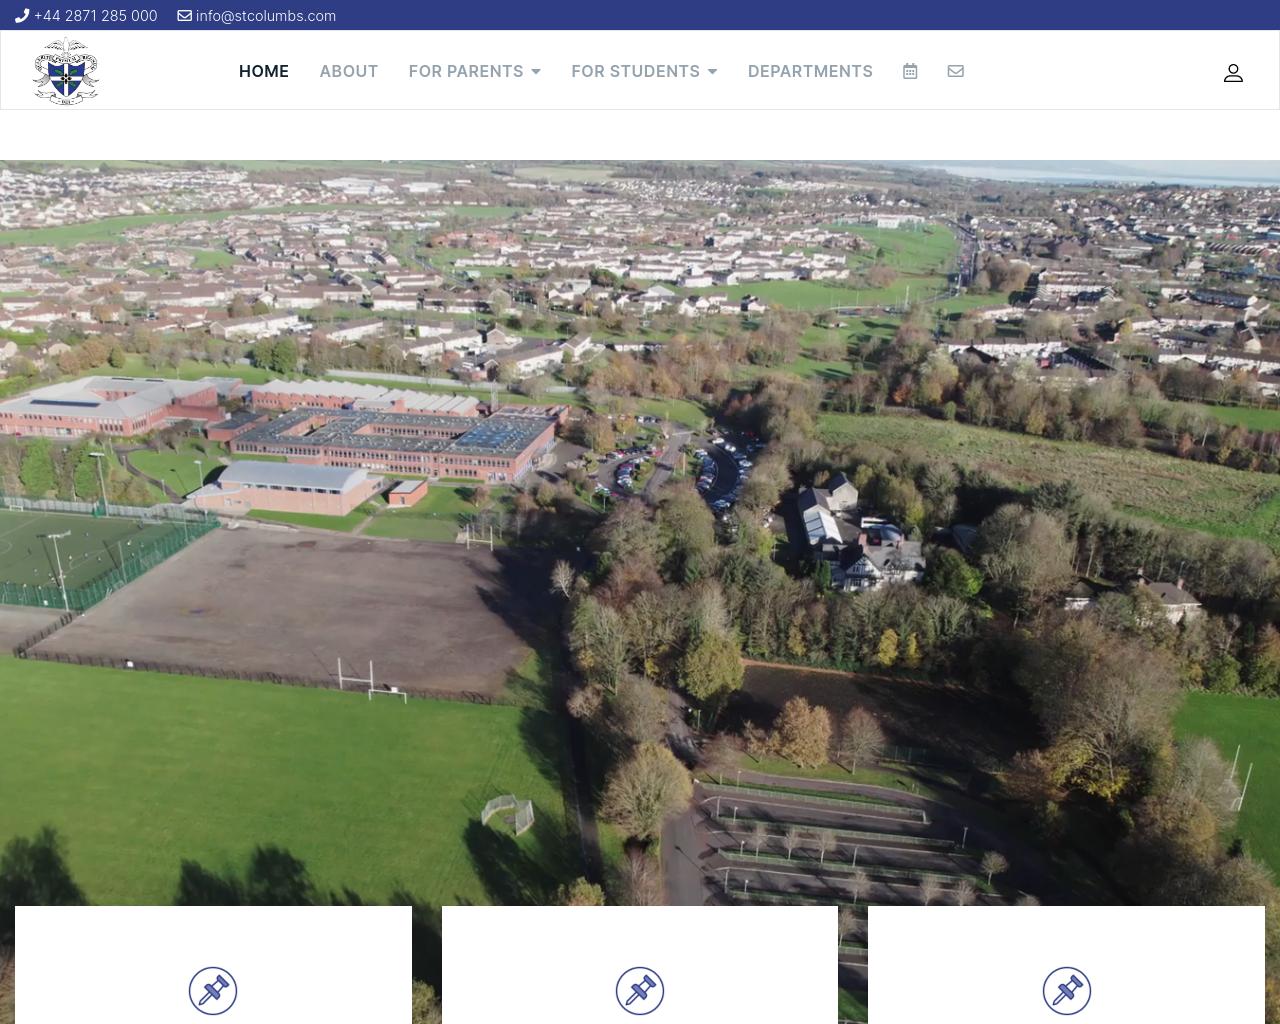 St. Columb's College Website